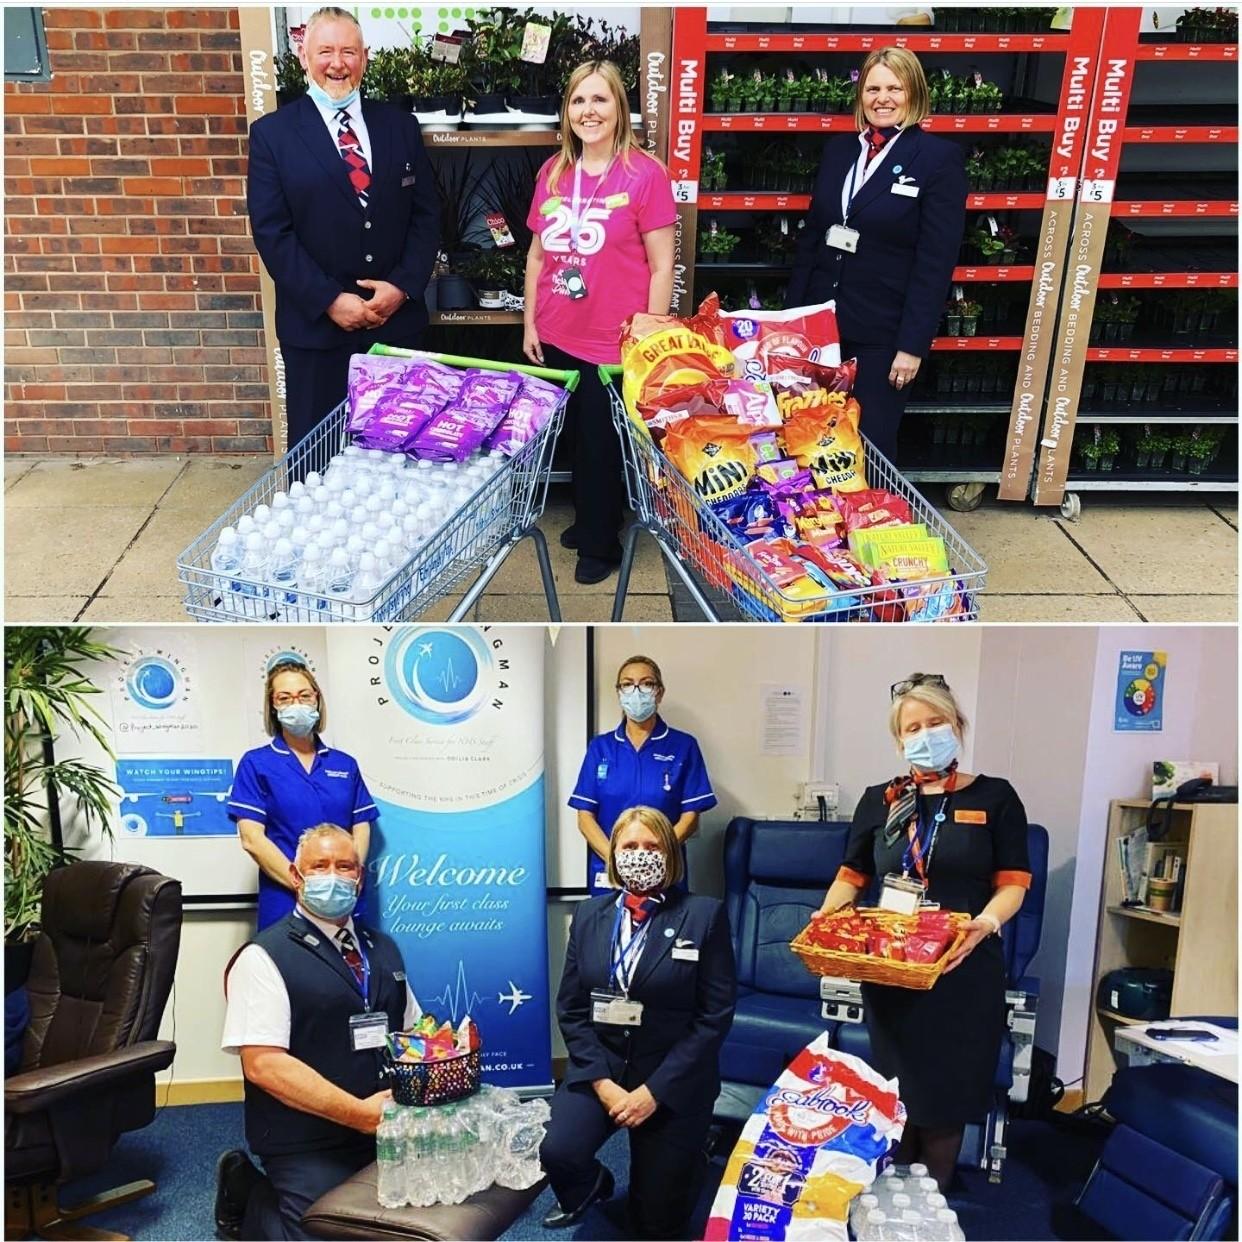 Project Wingman donation | Asda Waterlooville